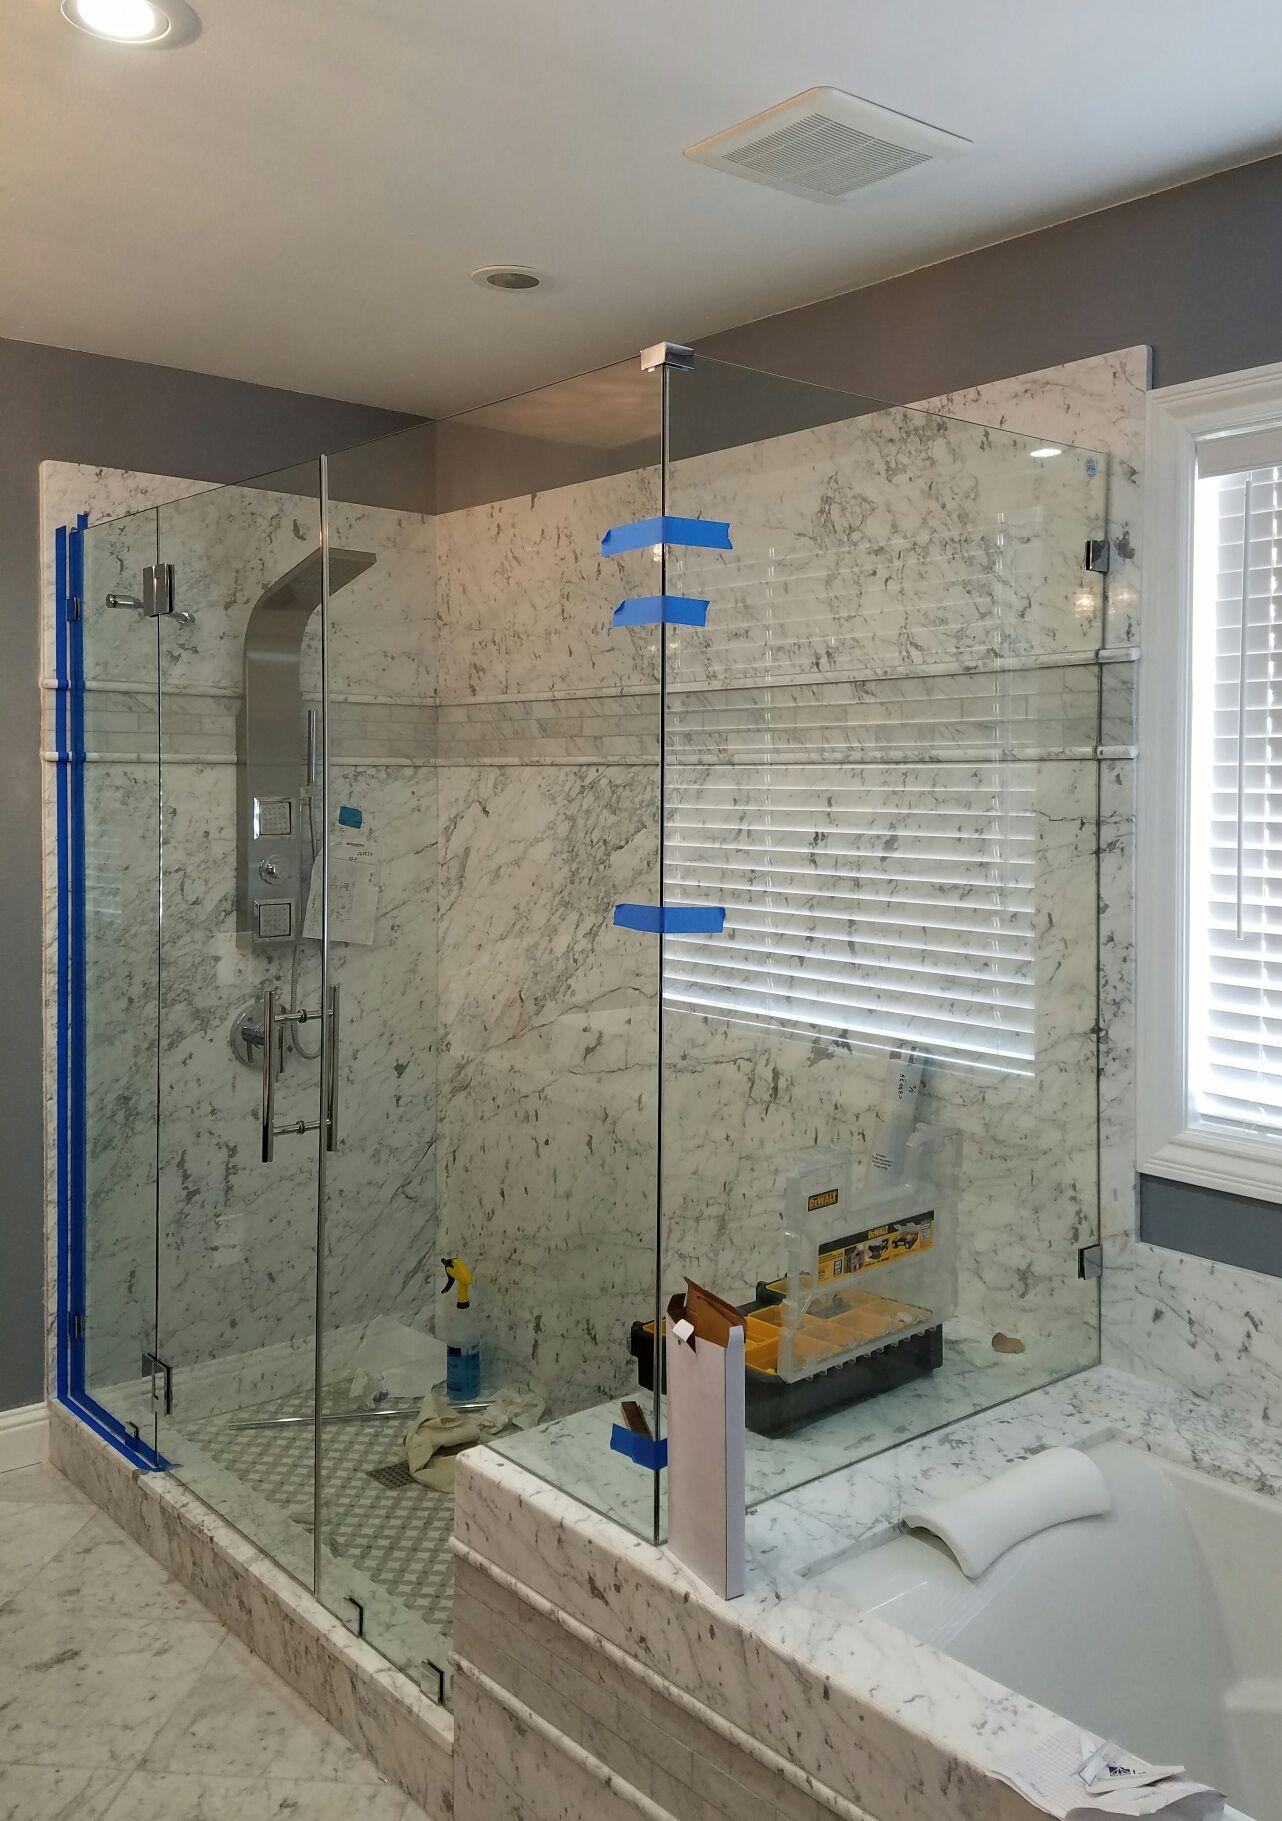 Glass and window pro installer madera ca 93637 yp glass and window pro installer can take care of all your glass door and window needs eventelaan Gallery